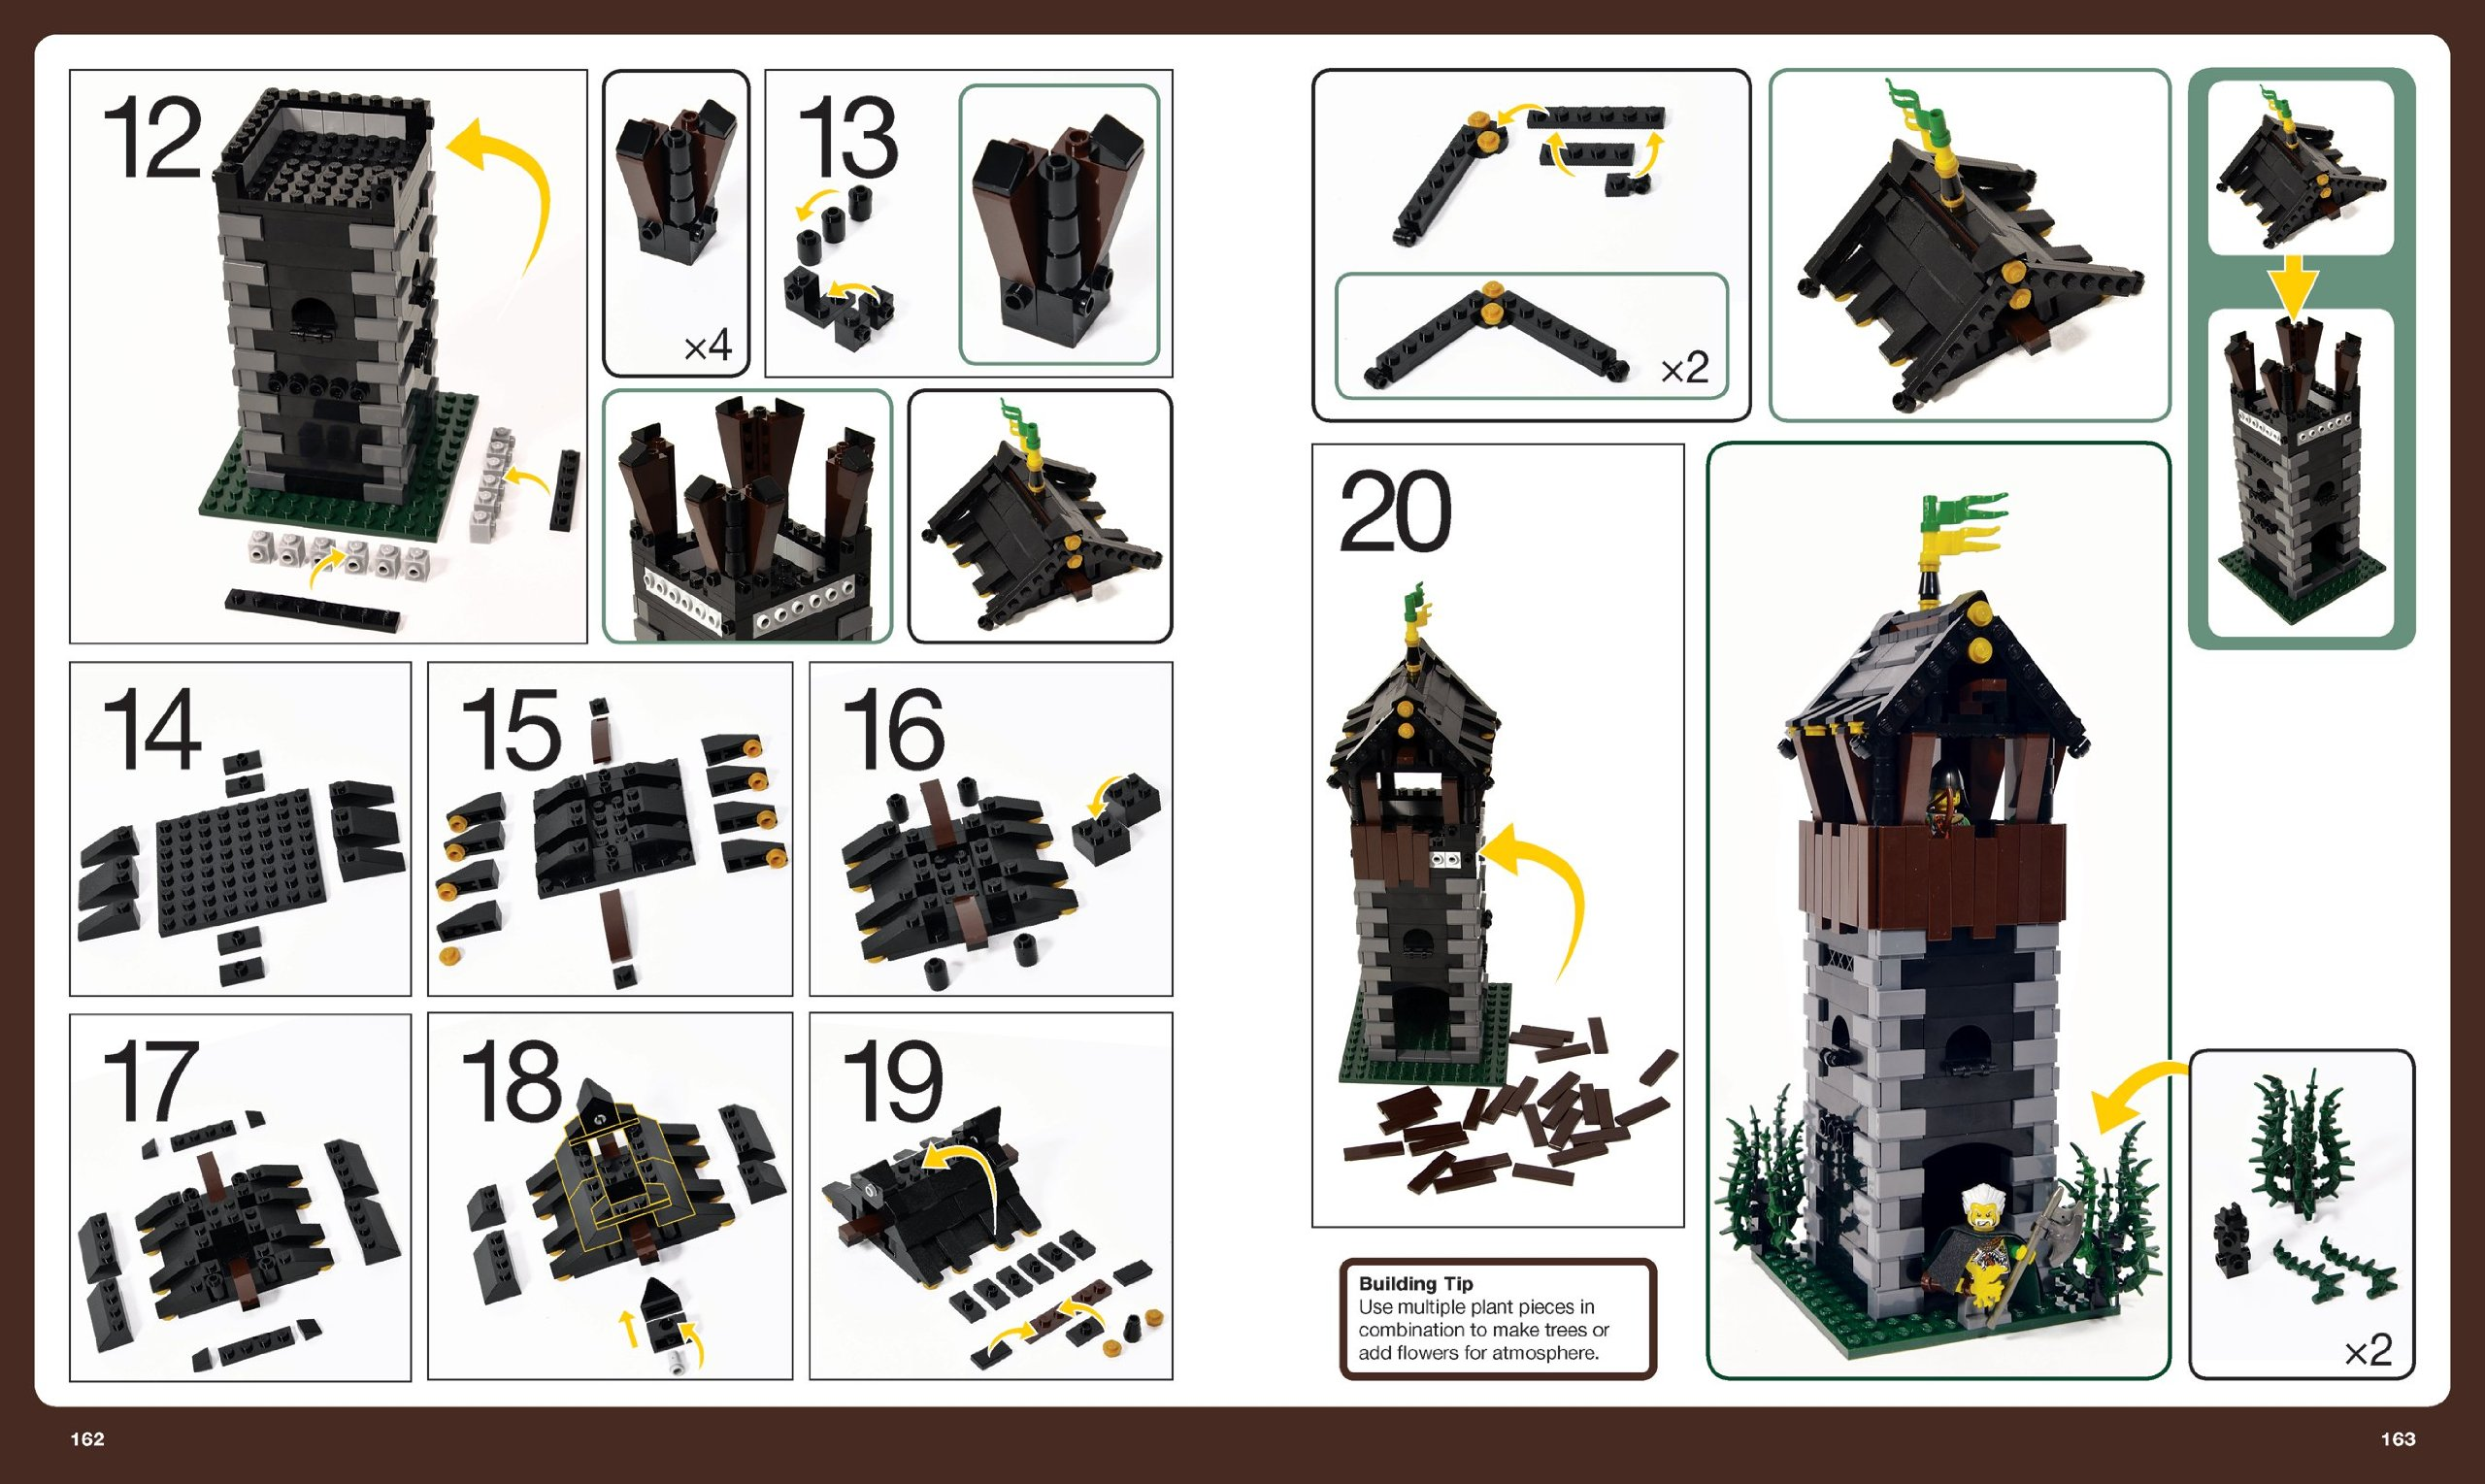 The lego adventure book vol 2 spaceships pirates dragons more megan h rothrock 9781593275129 amazon com books